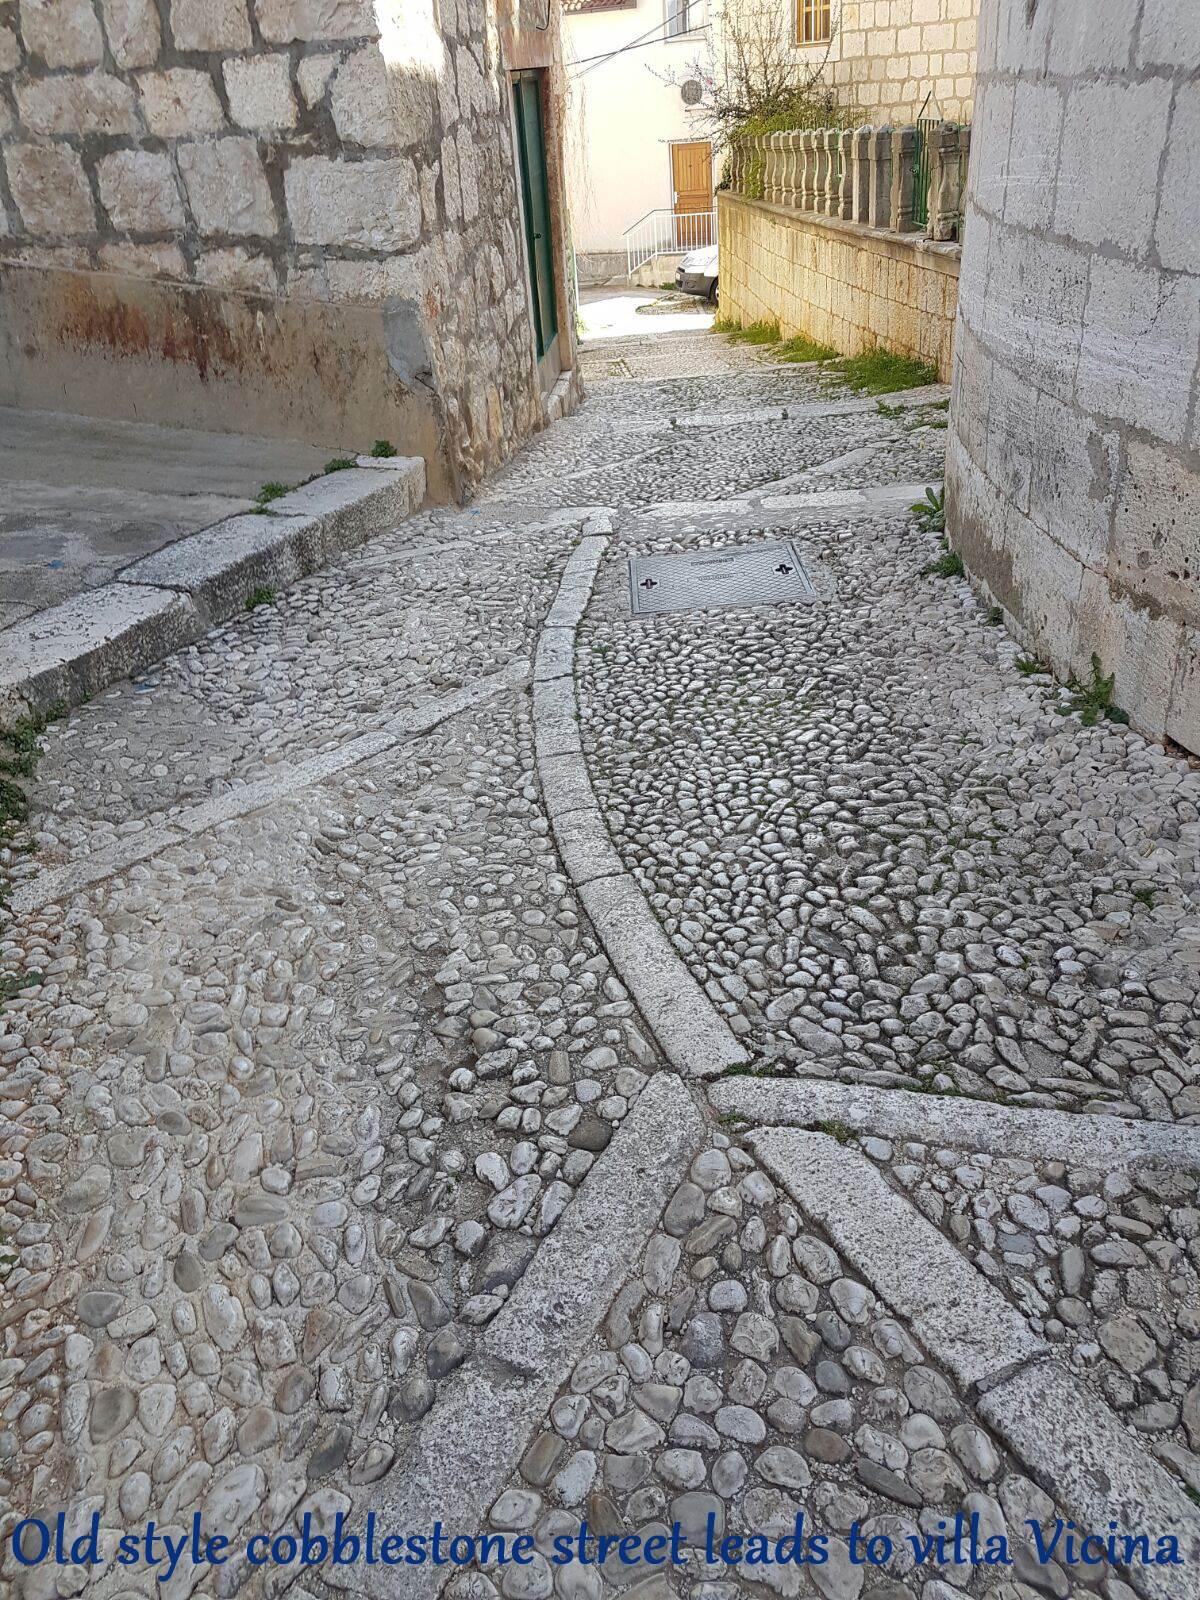 Old style cobblestone street leading to Villa Vicina